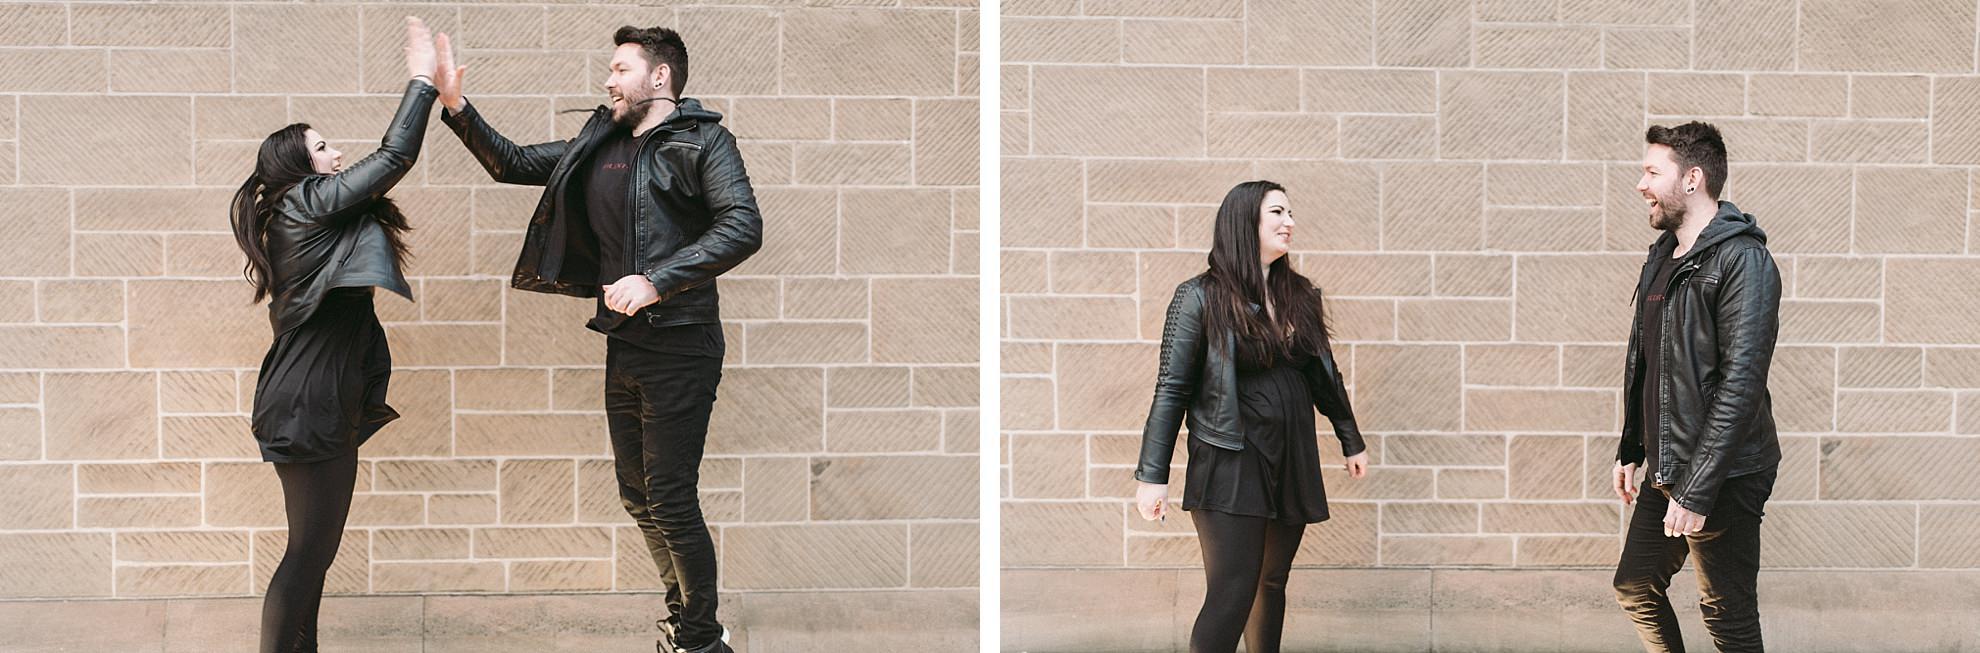 Melbourne Natural Fun Engagement Couples Photographer-22_WEB.jpg